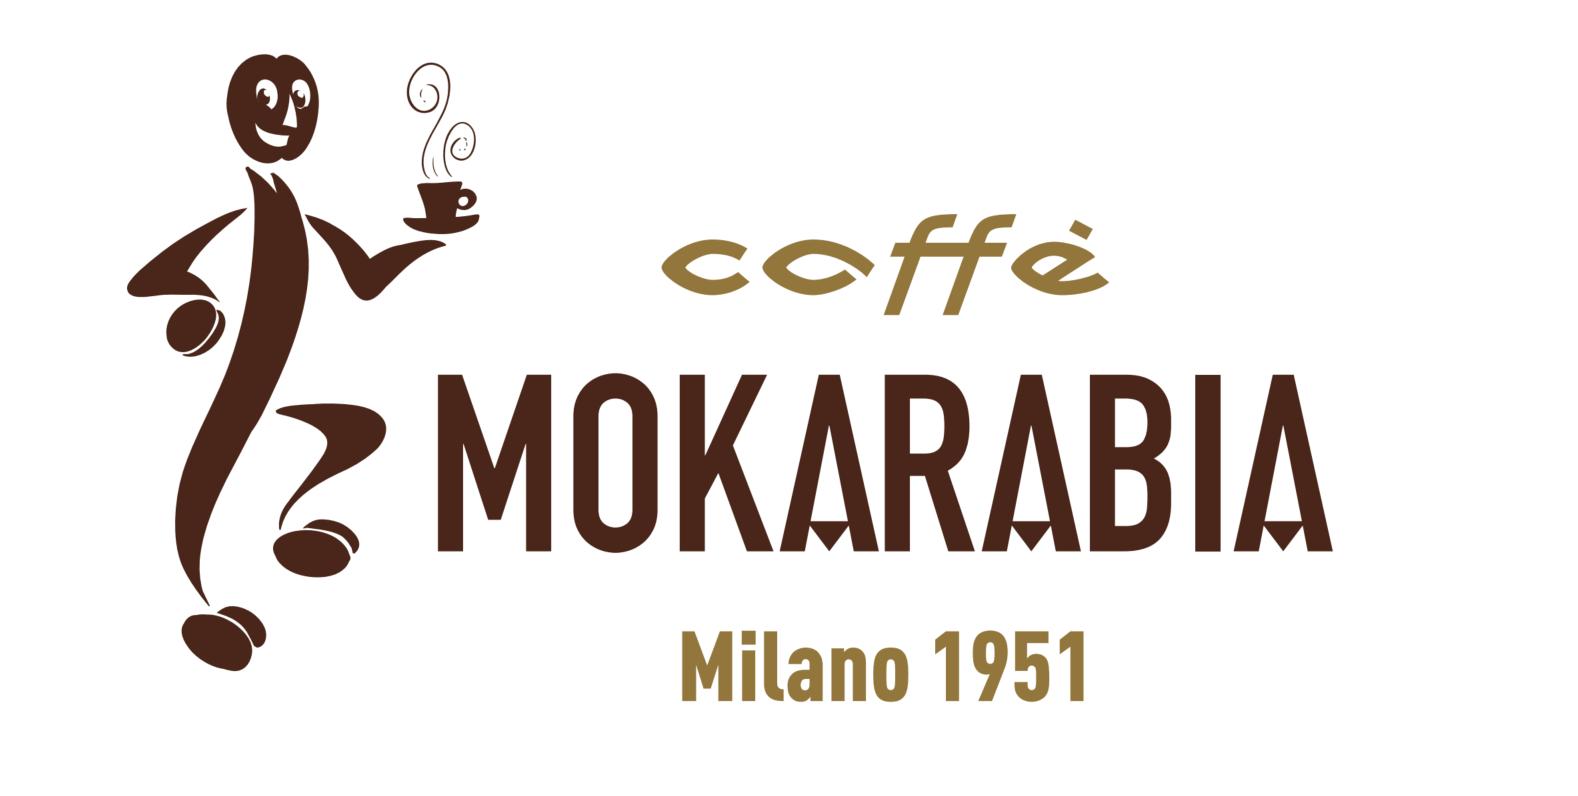 Mokarabia Logo